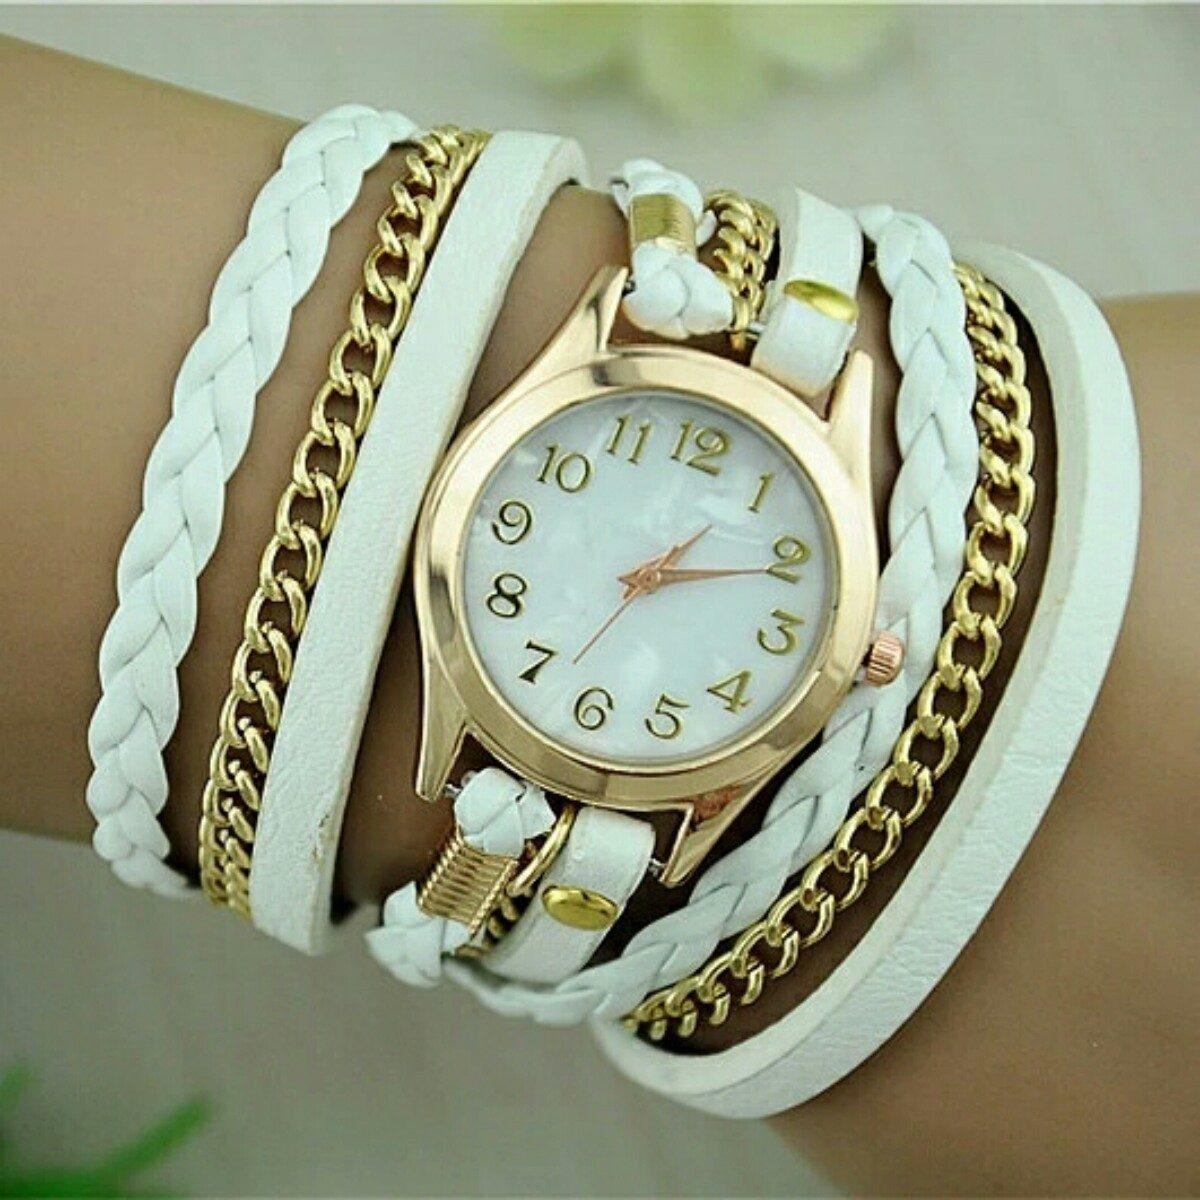 40347f329e3 relógio feminino bracelete dourado pronta entrega barato top. Carregando  zoom.